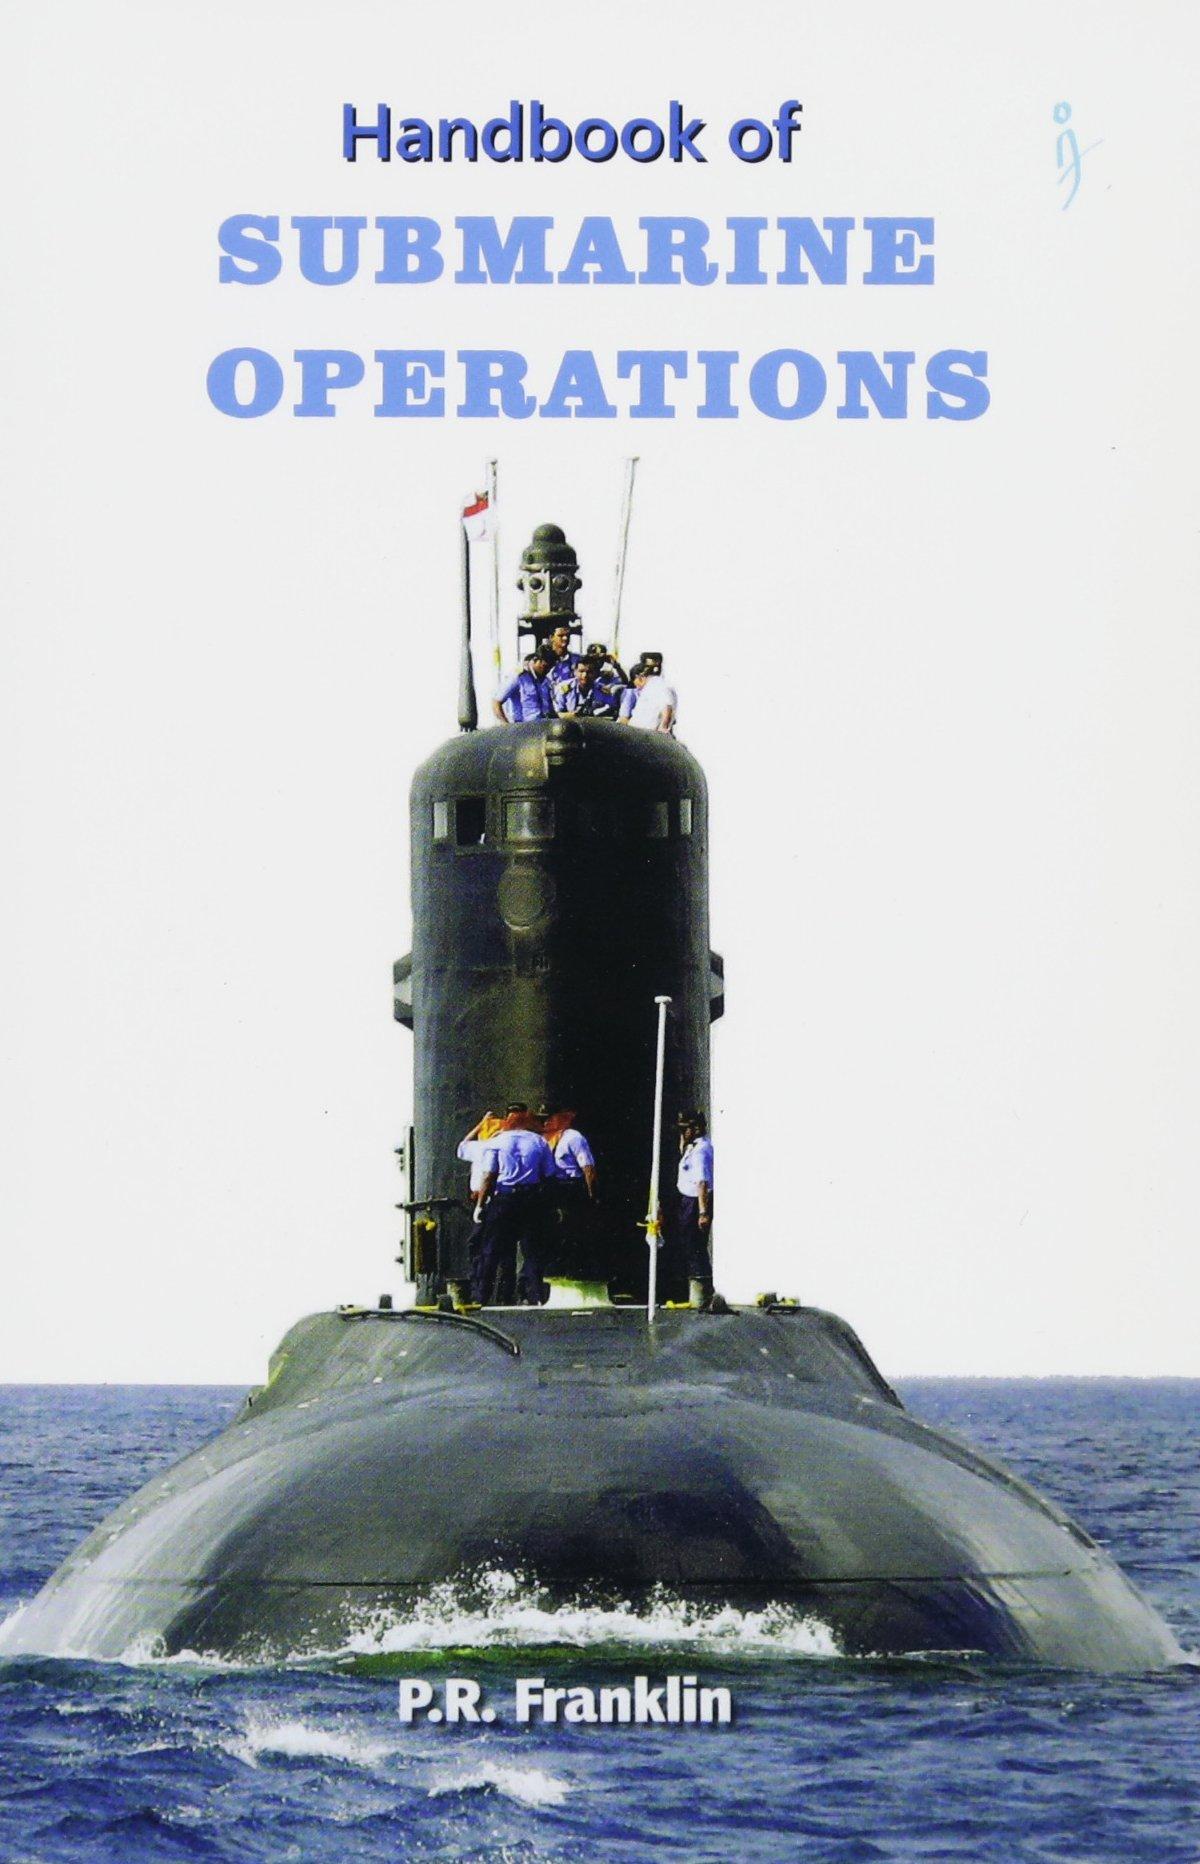 Handbook of Submarine Operations: Cmde P R Franklin (Retd